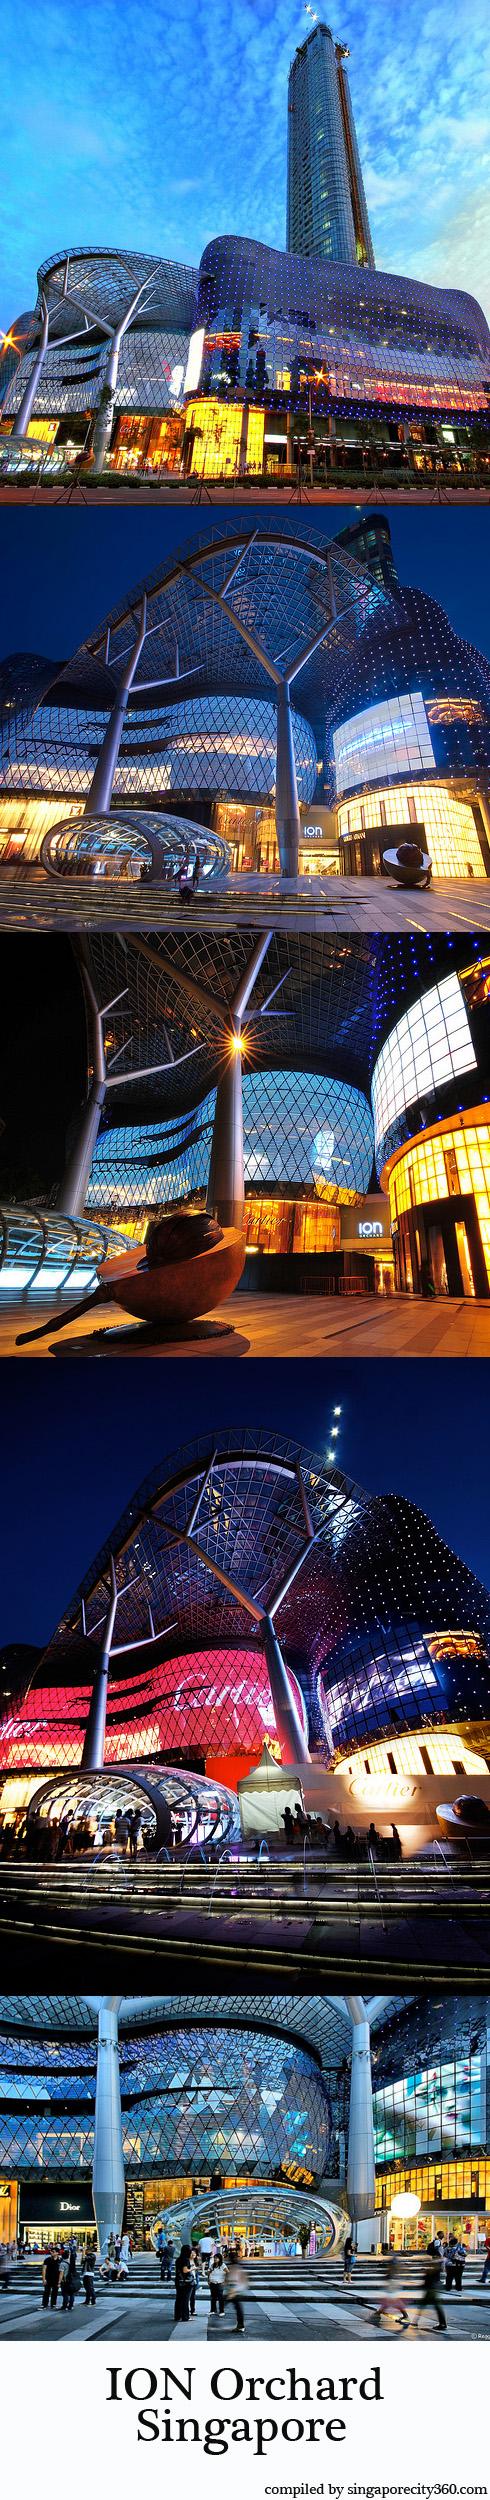 Ion Orchard Singapore